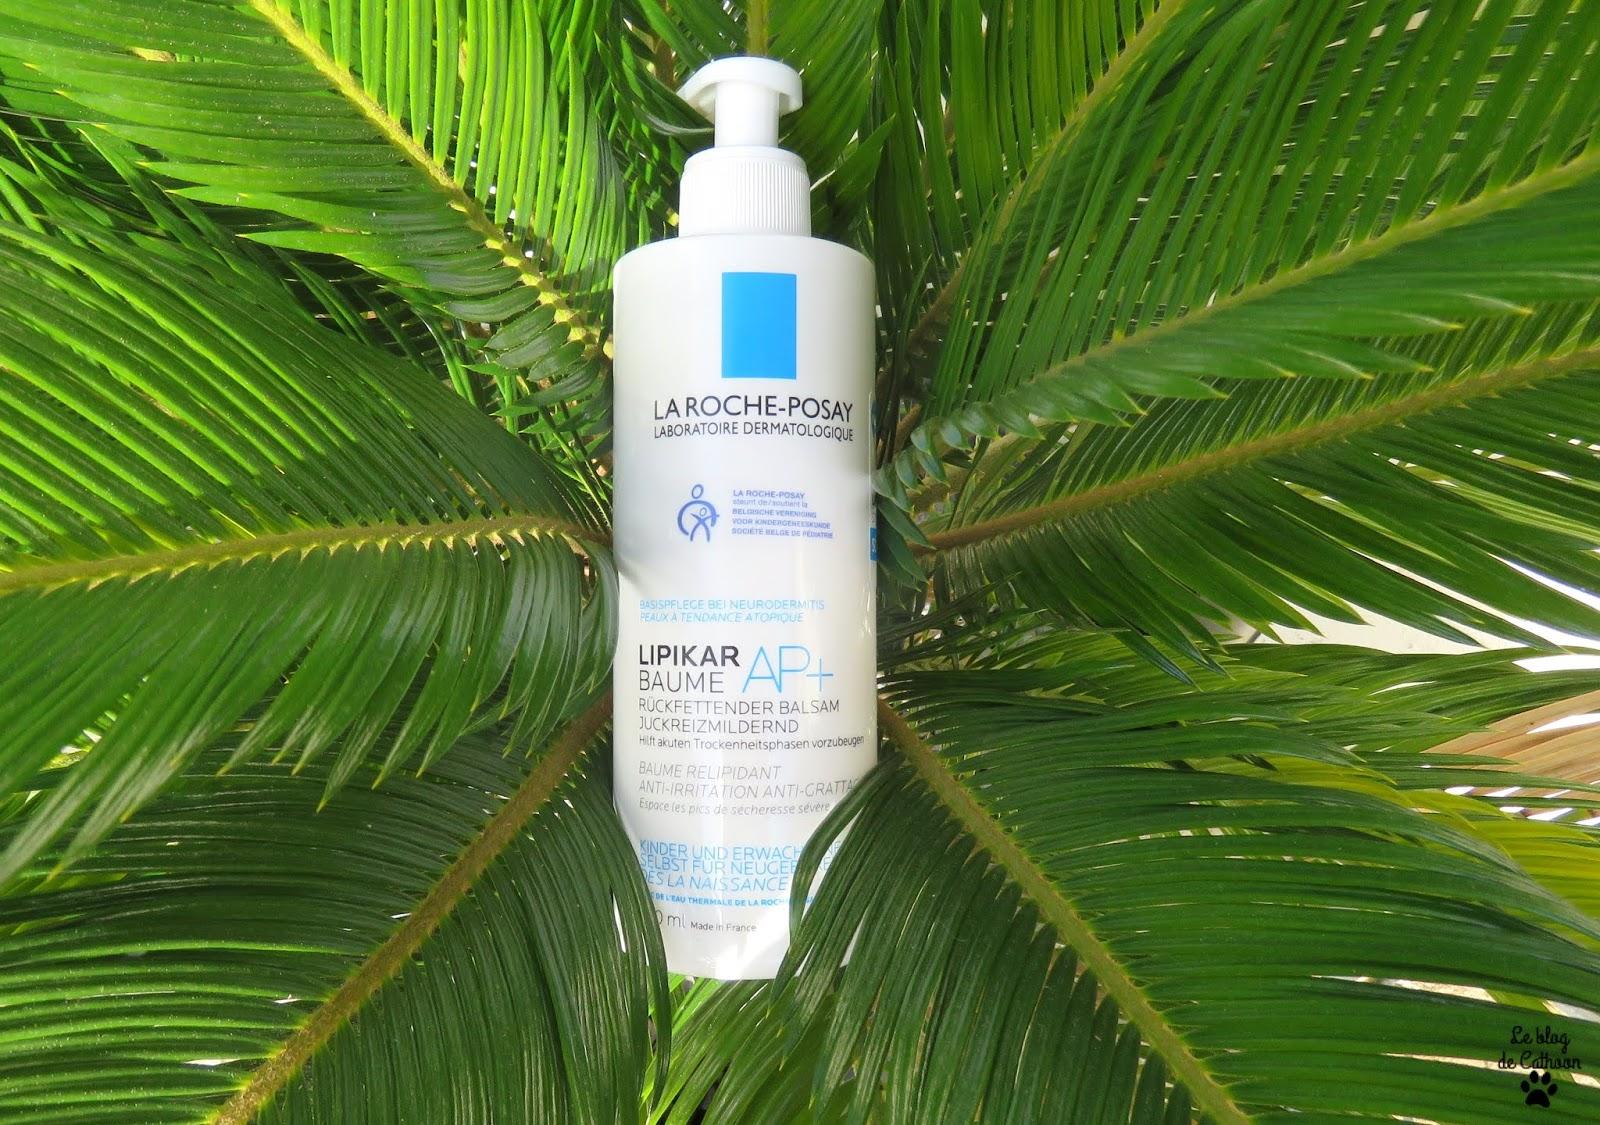 Lipikar Baume AP+ - Baume Relipidant Anti-Irritation Anti-grattage - La Roche-Posay